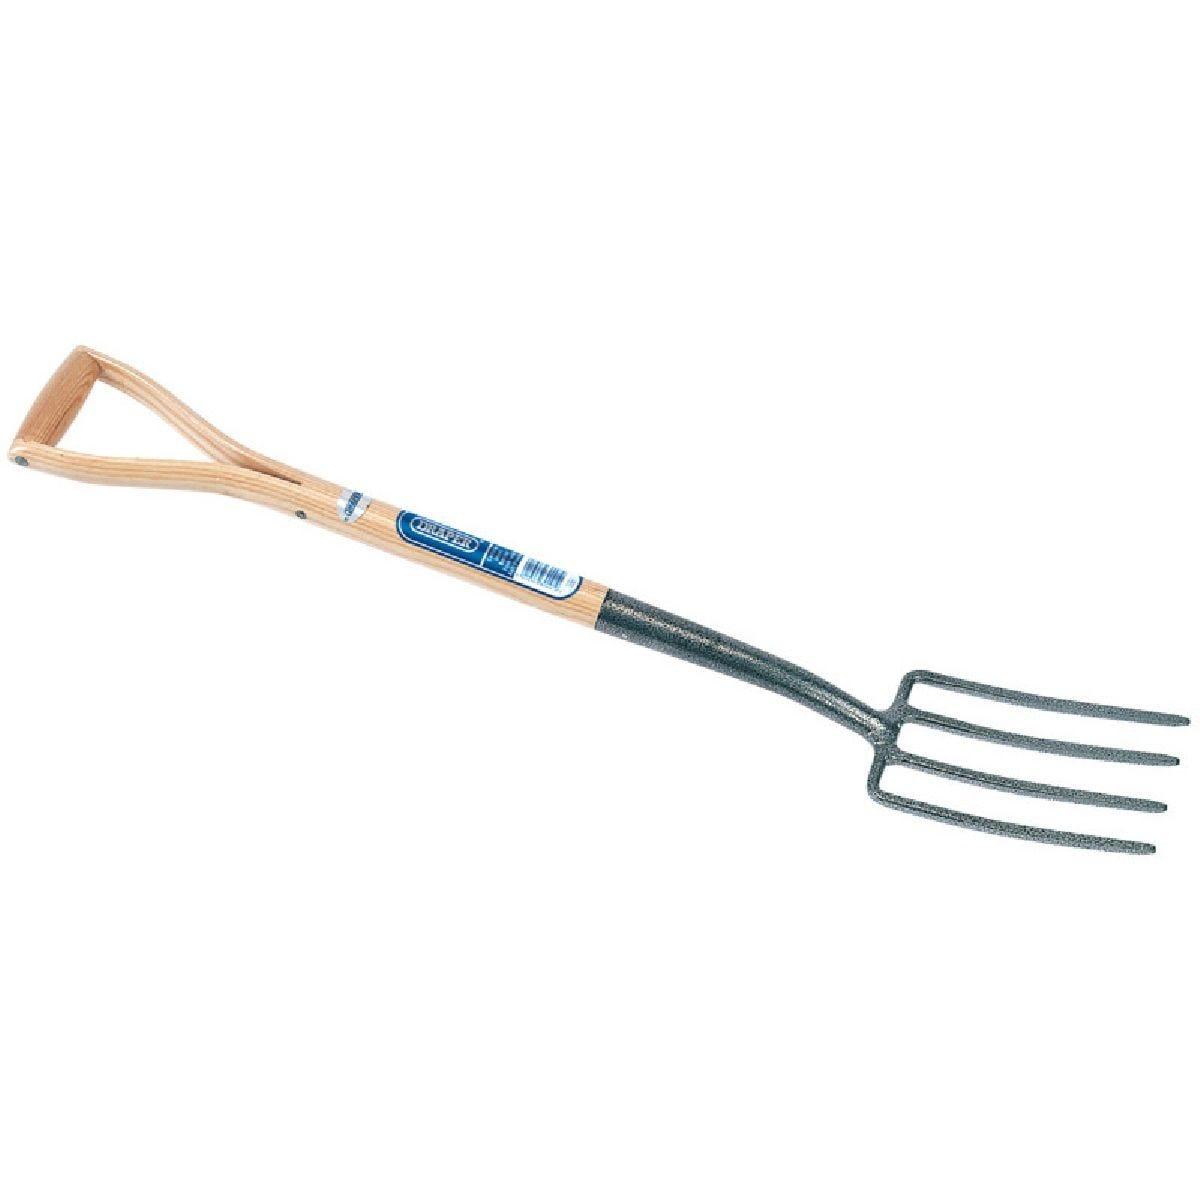 Draper Carbon Steel Border Fork with Ash Handle